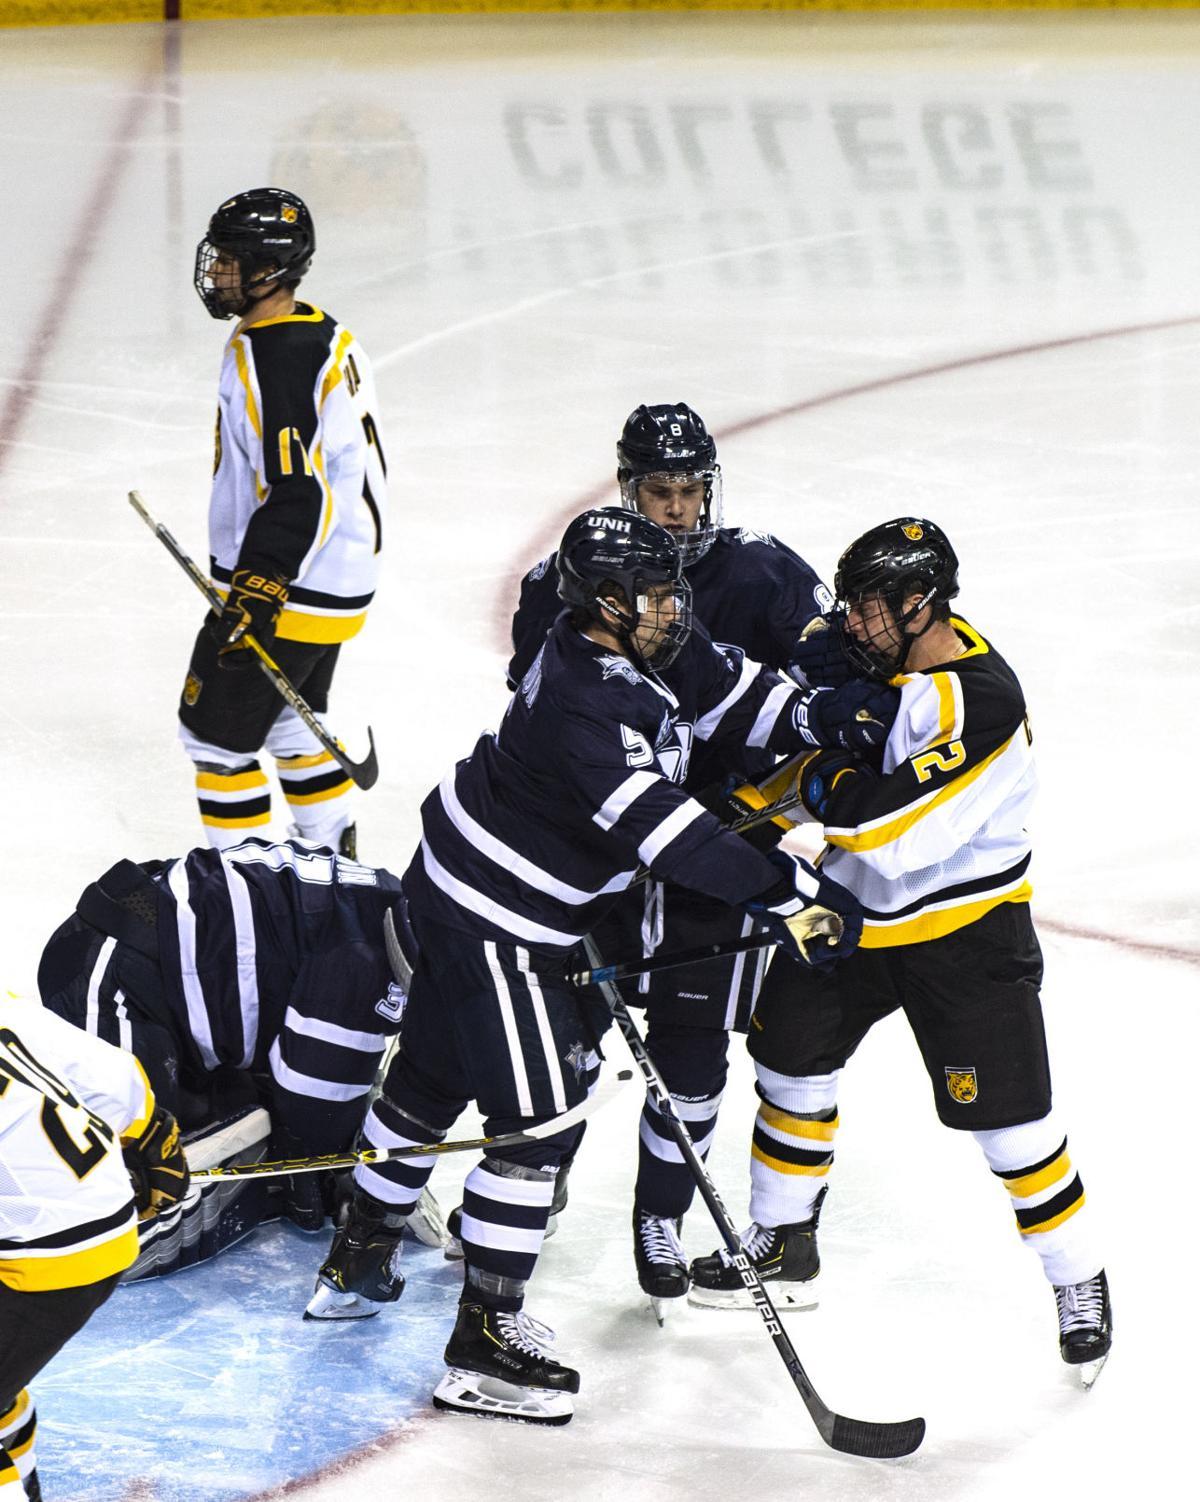 102118-s-cchockey-0654.jpg